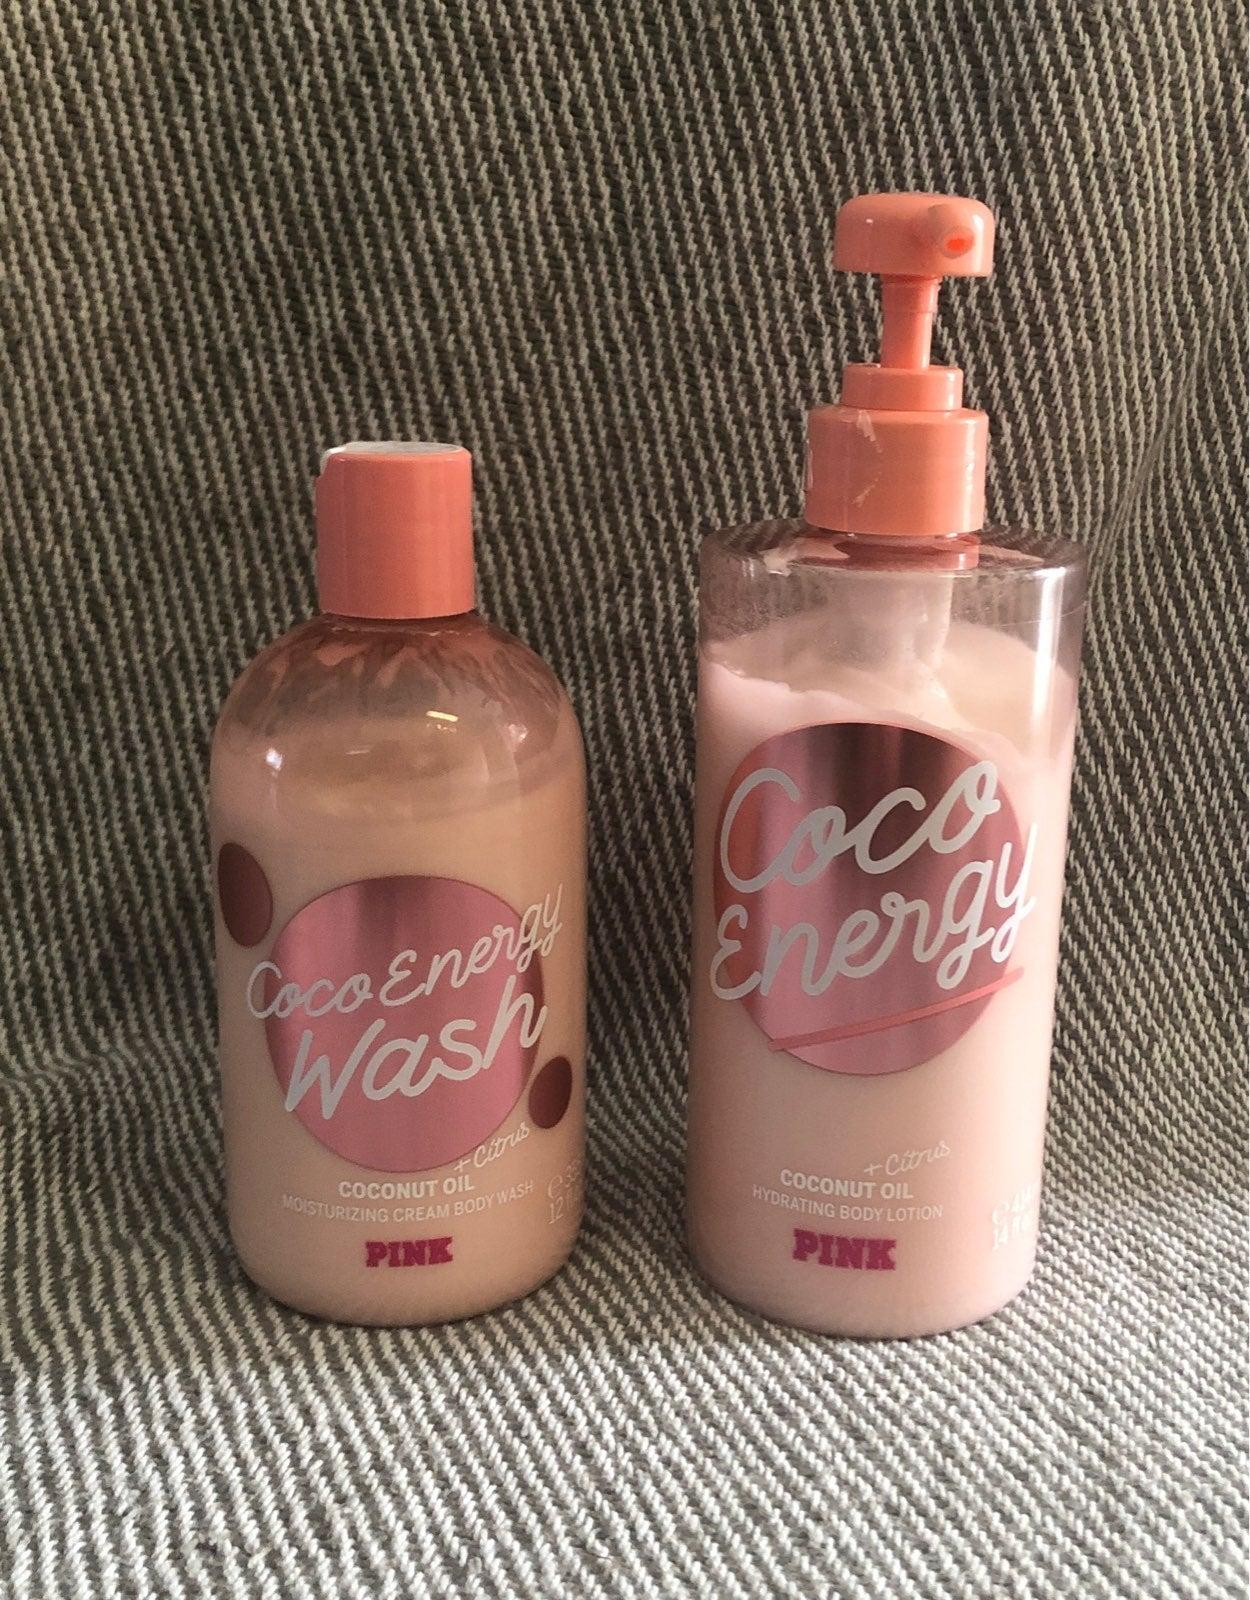 Pink Coco Energy Set